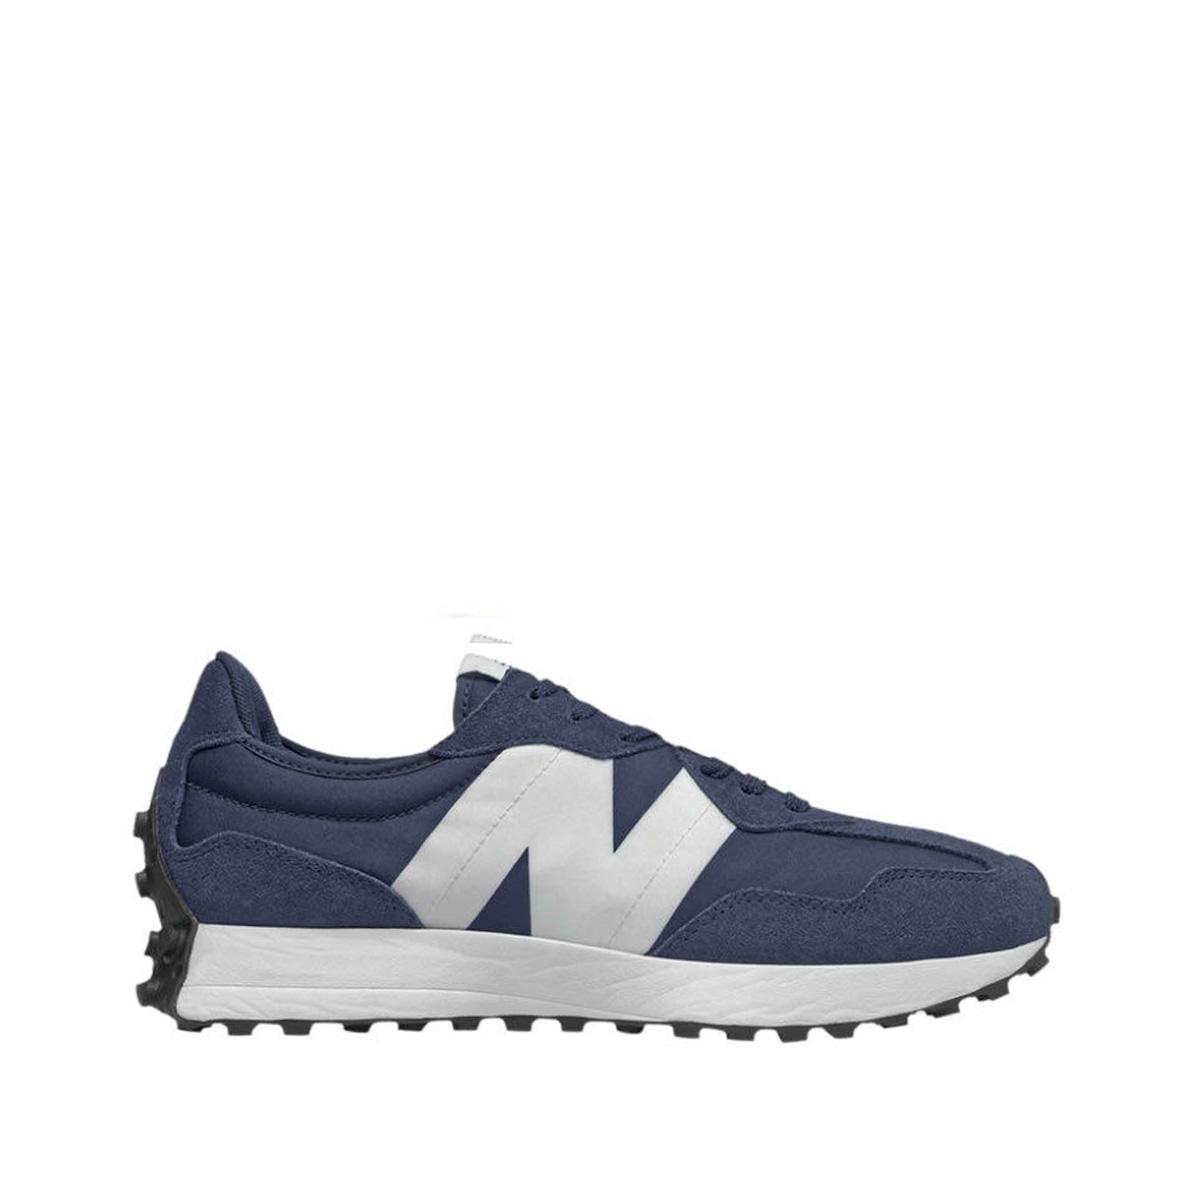 New Balance 327 V1